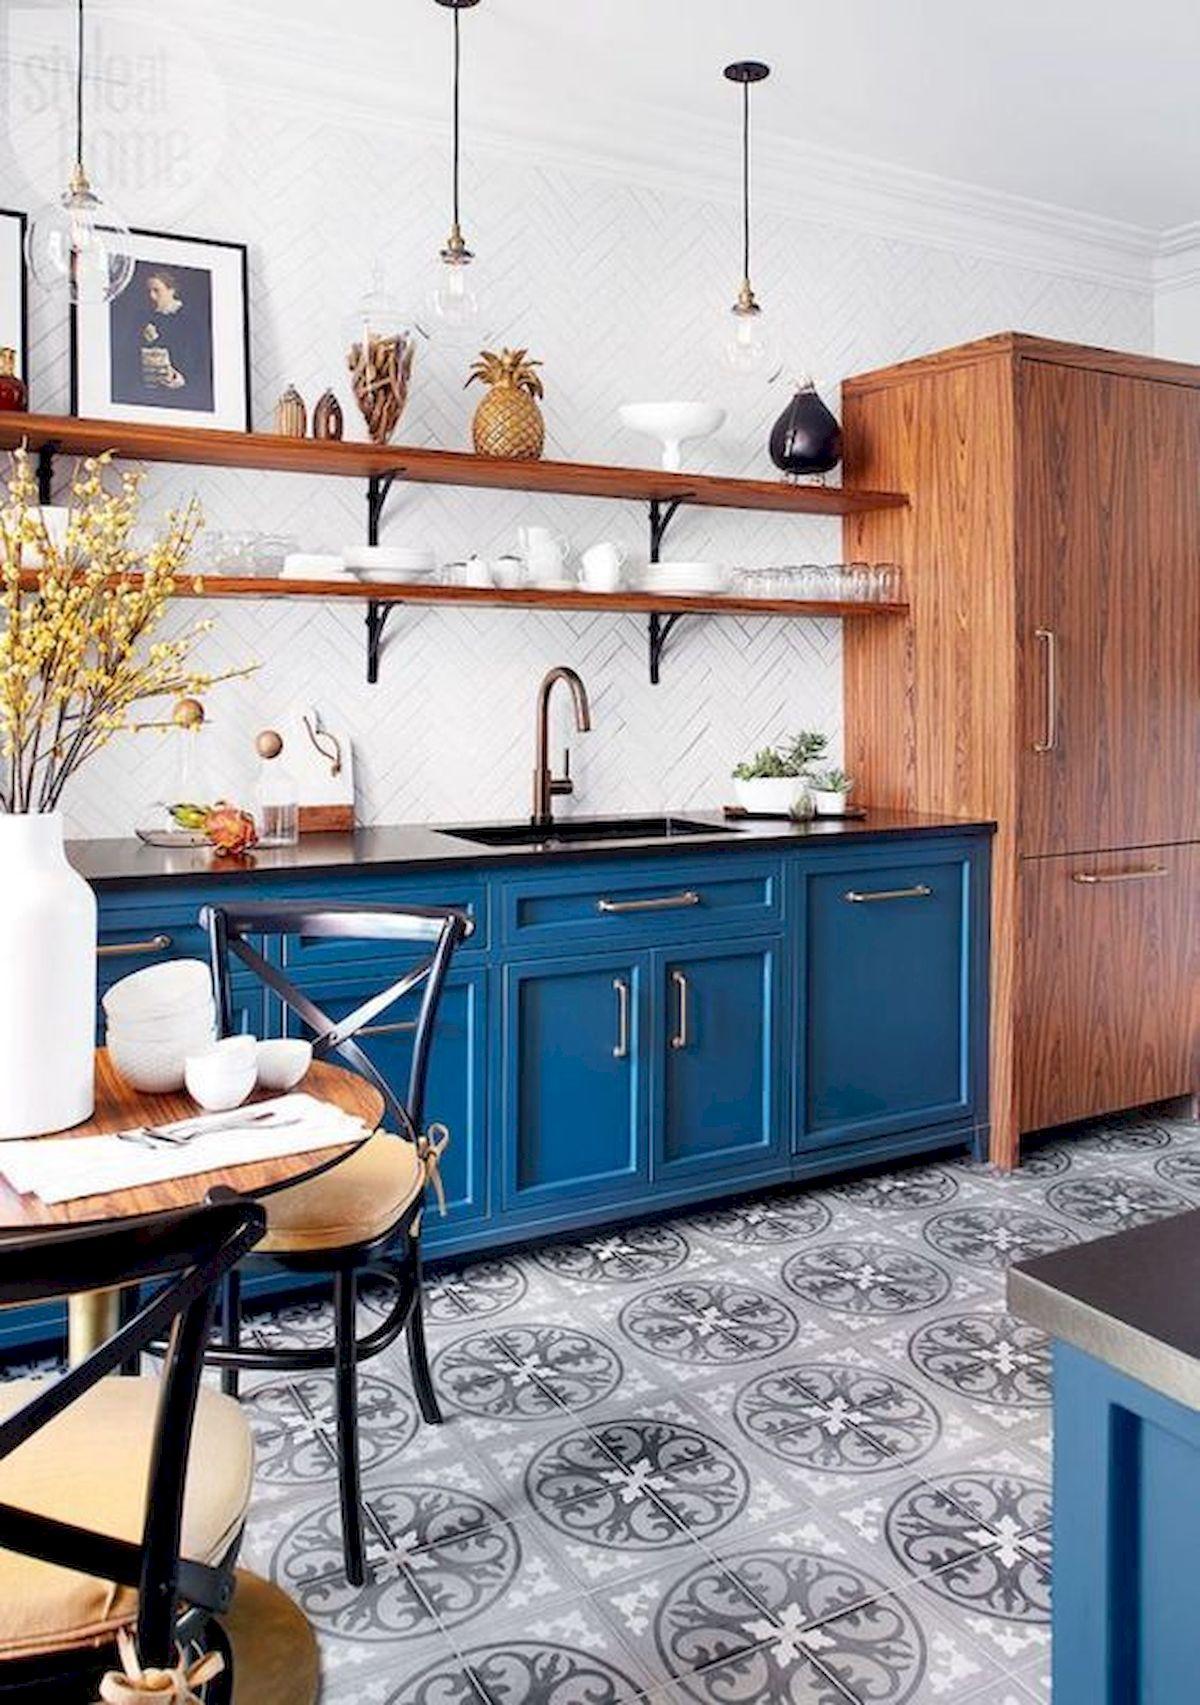 40 Best Tile Flooring Designs Ideas For Modern Kitchen (35)